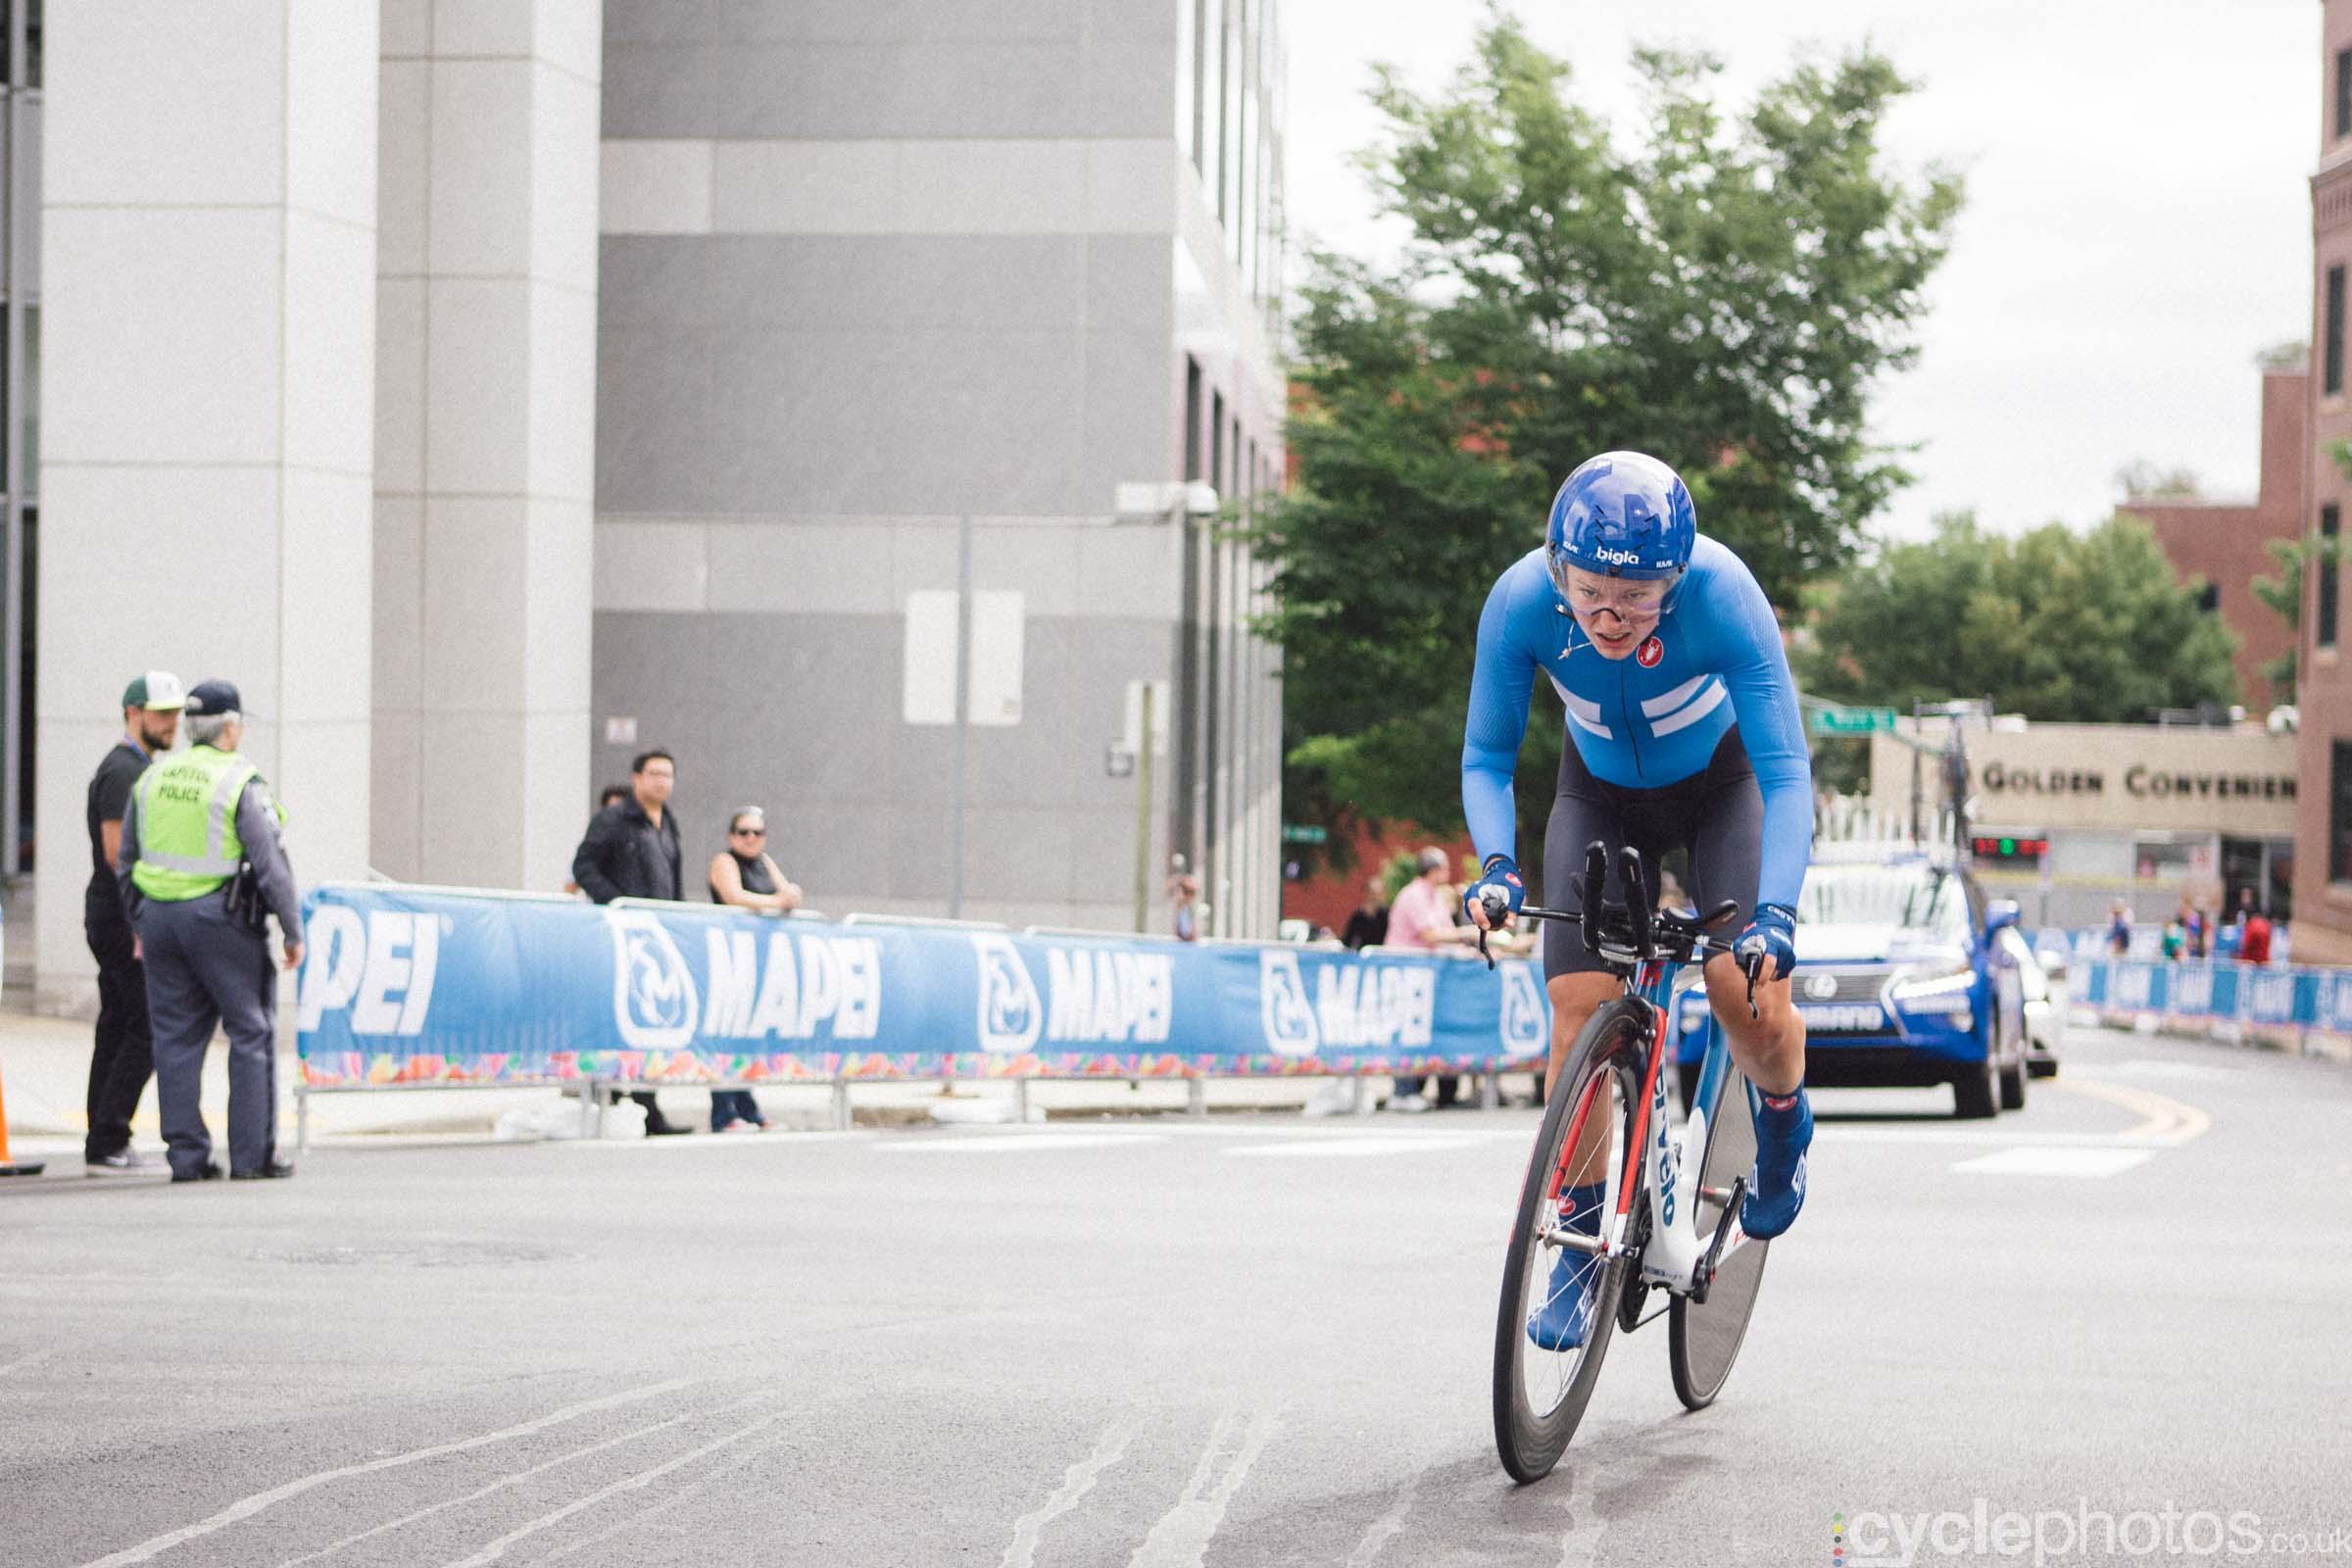 cyclephotos-world-champs-richmond-150914